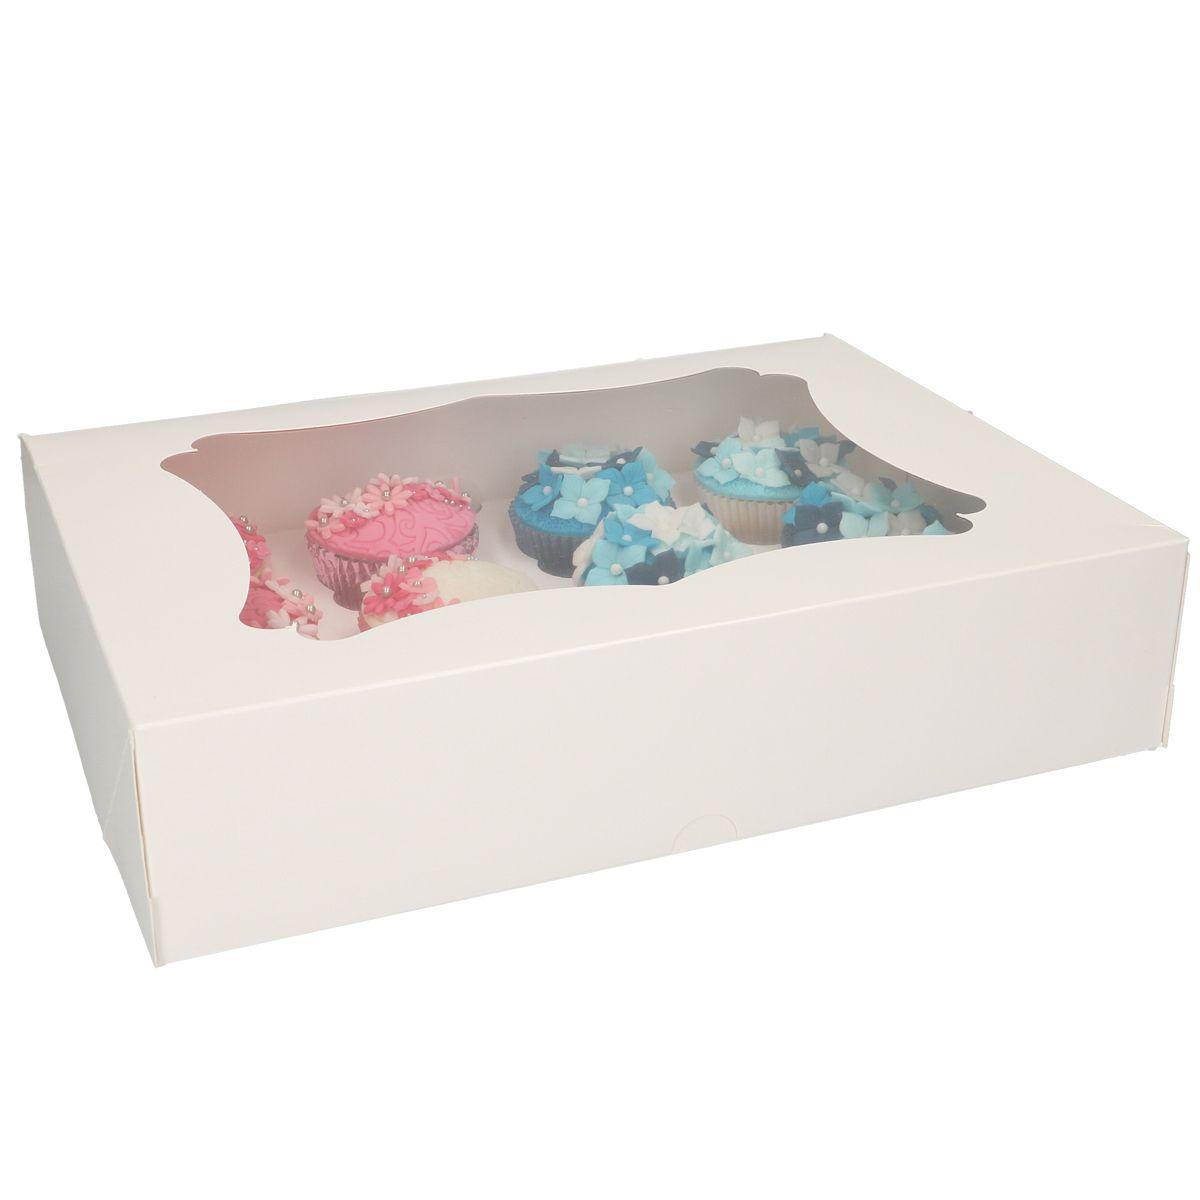 Boîte pour 12 cupcakes FunCakes – Blanc